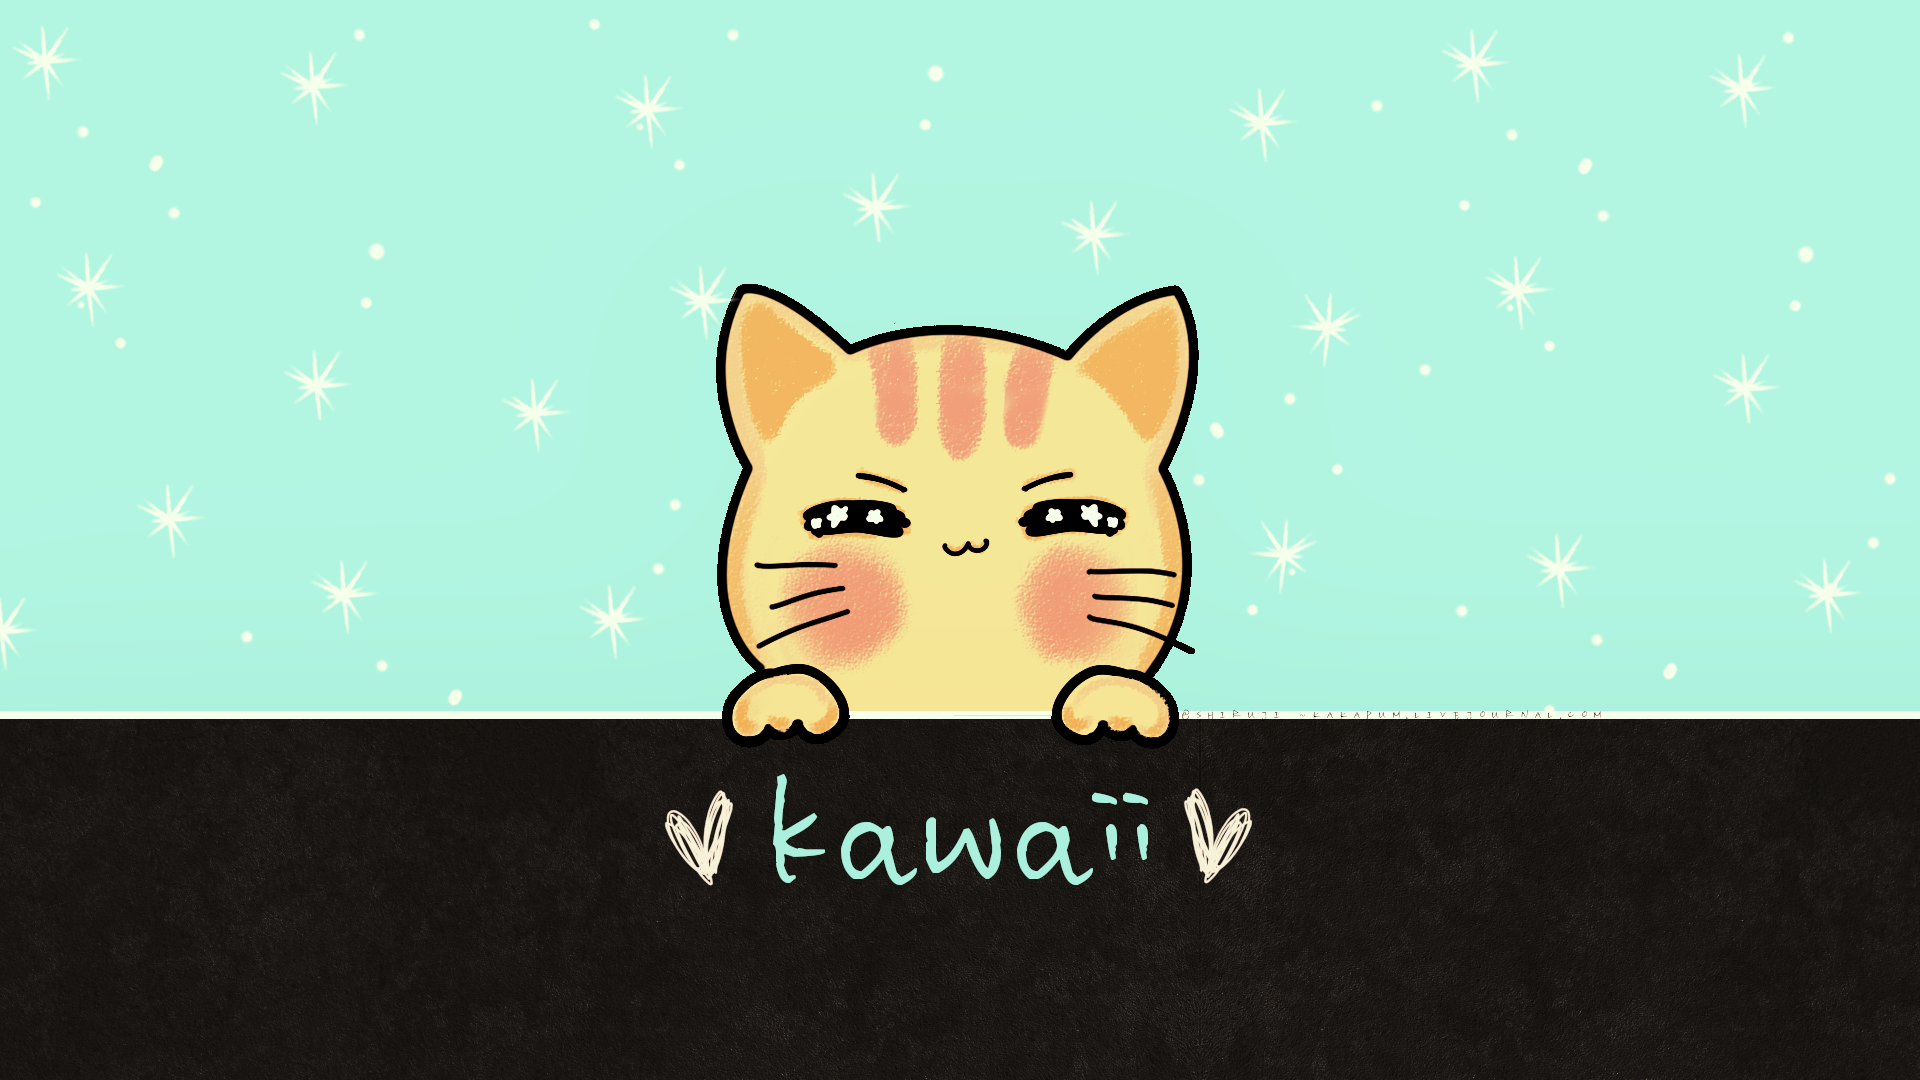 Kawaii Kat (Wallpaper) Kakapum@lj